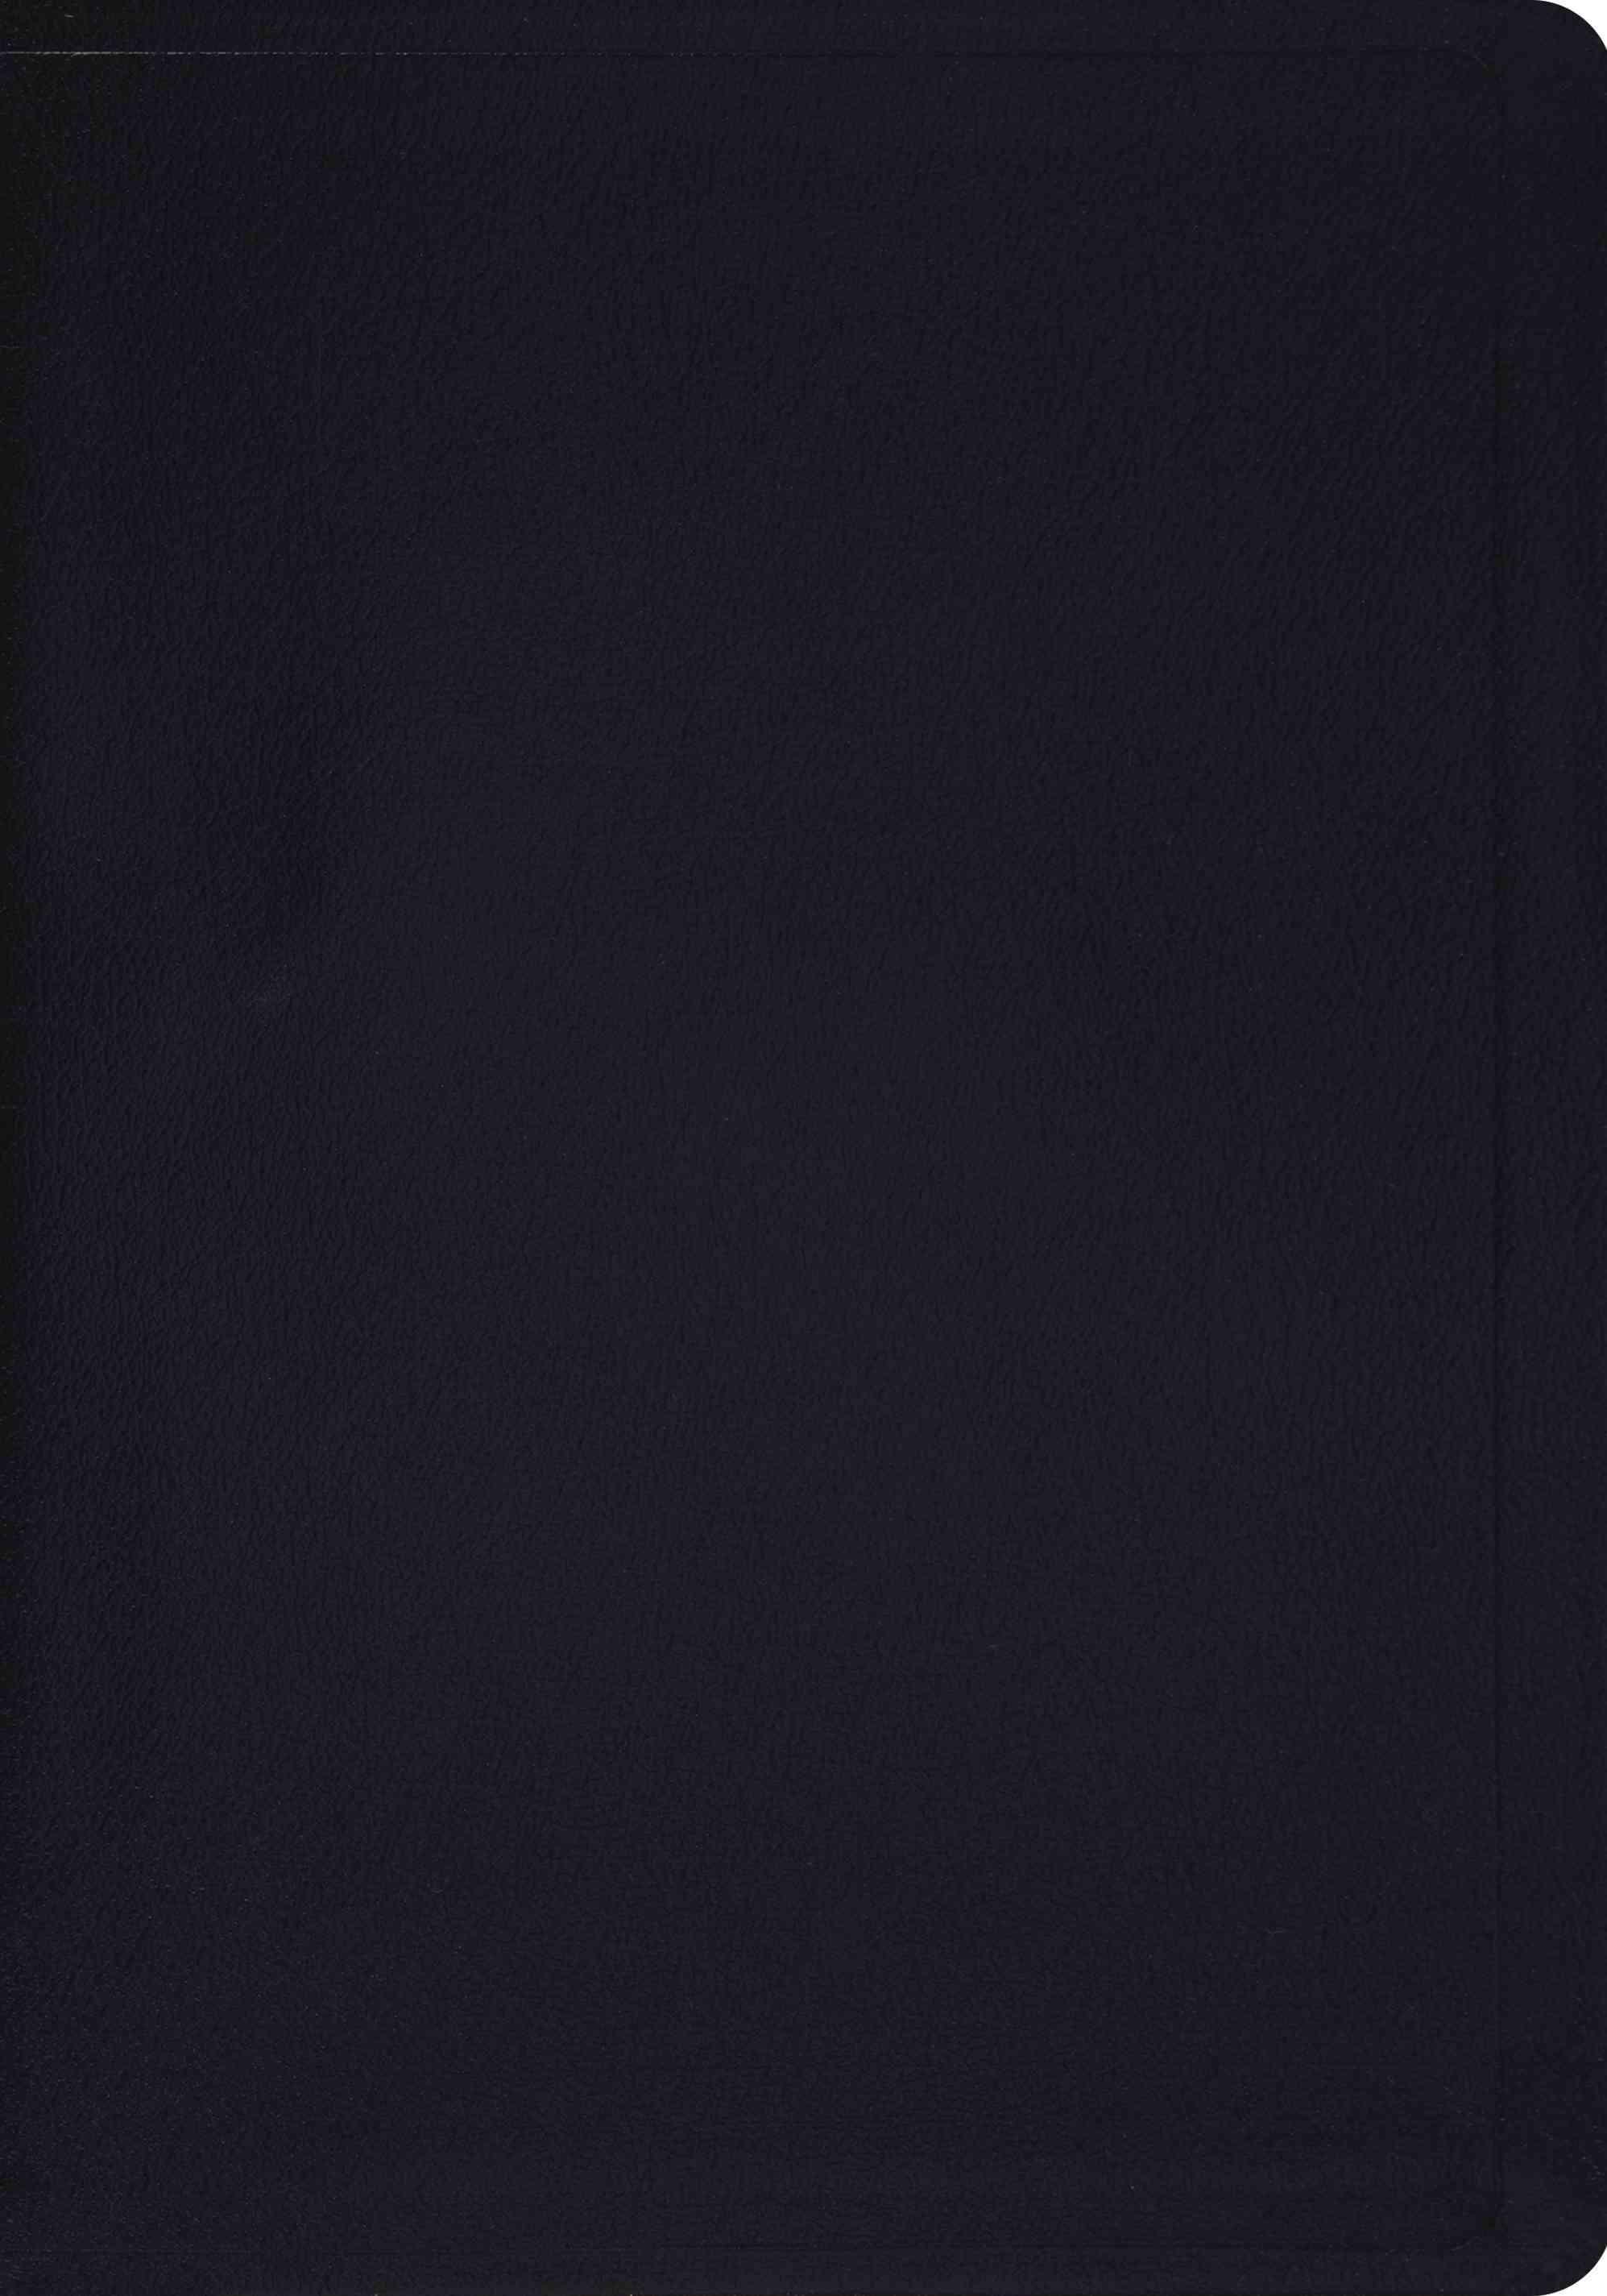 Holy Bible: English Standard Version, Black, Genuine Leather (Paperback)